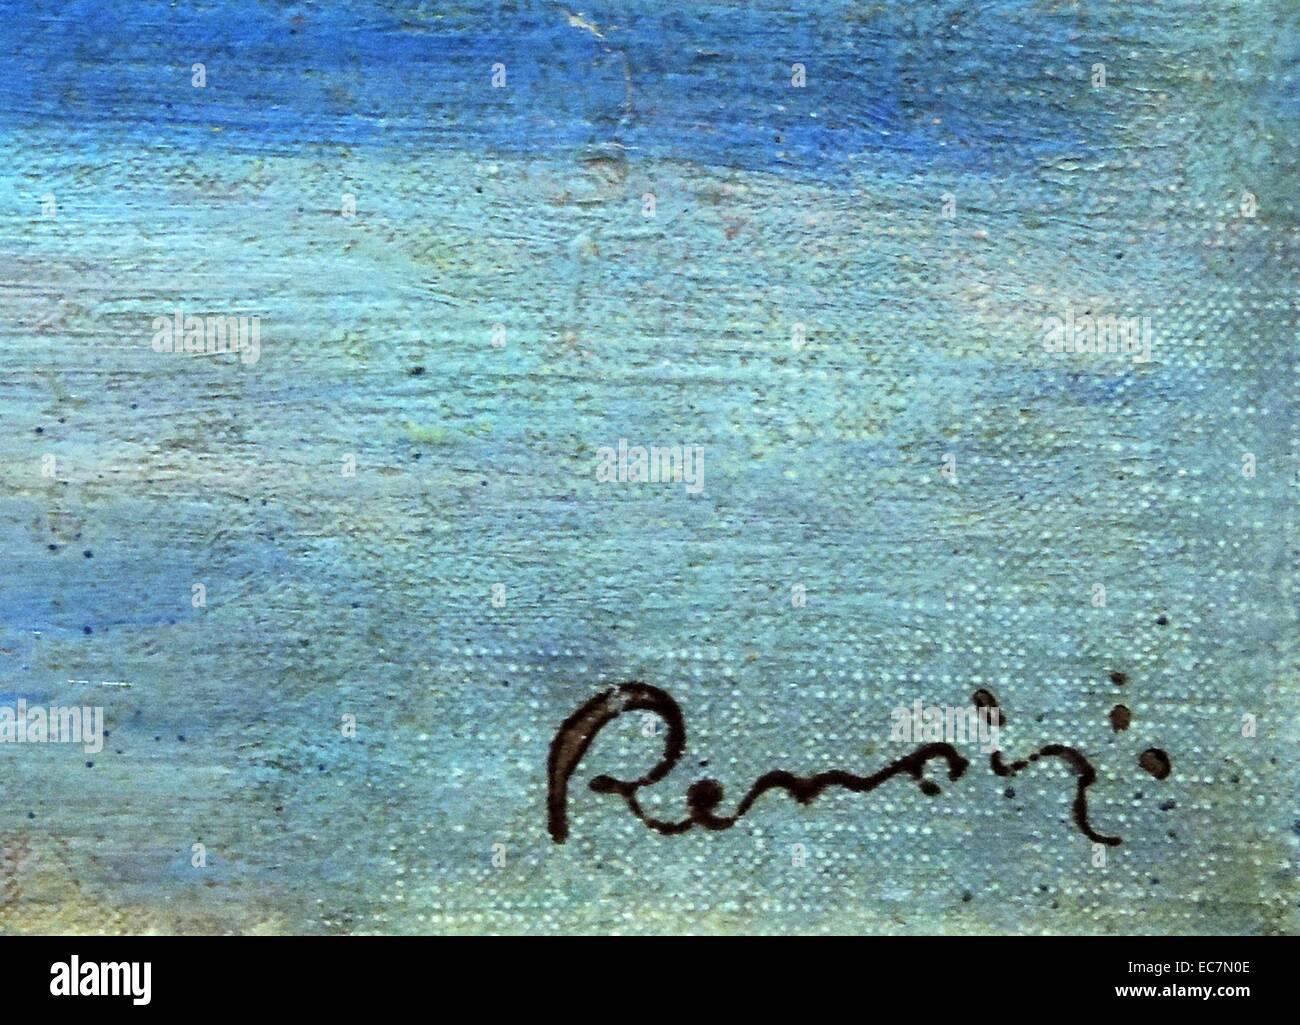 Cros de Cagnes, Mer Montagnes by Auguste Renoir - Stock Image